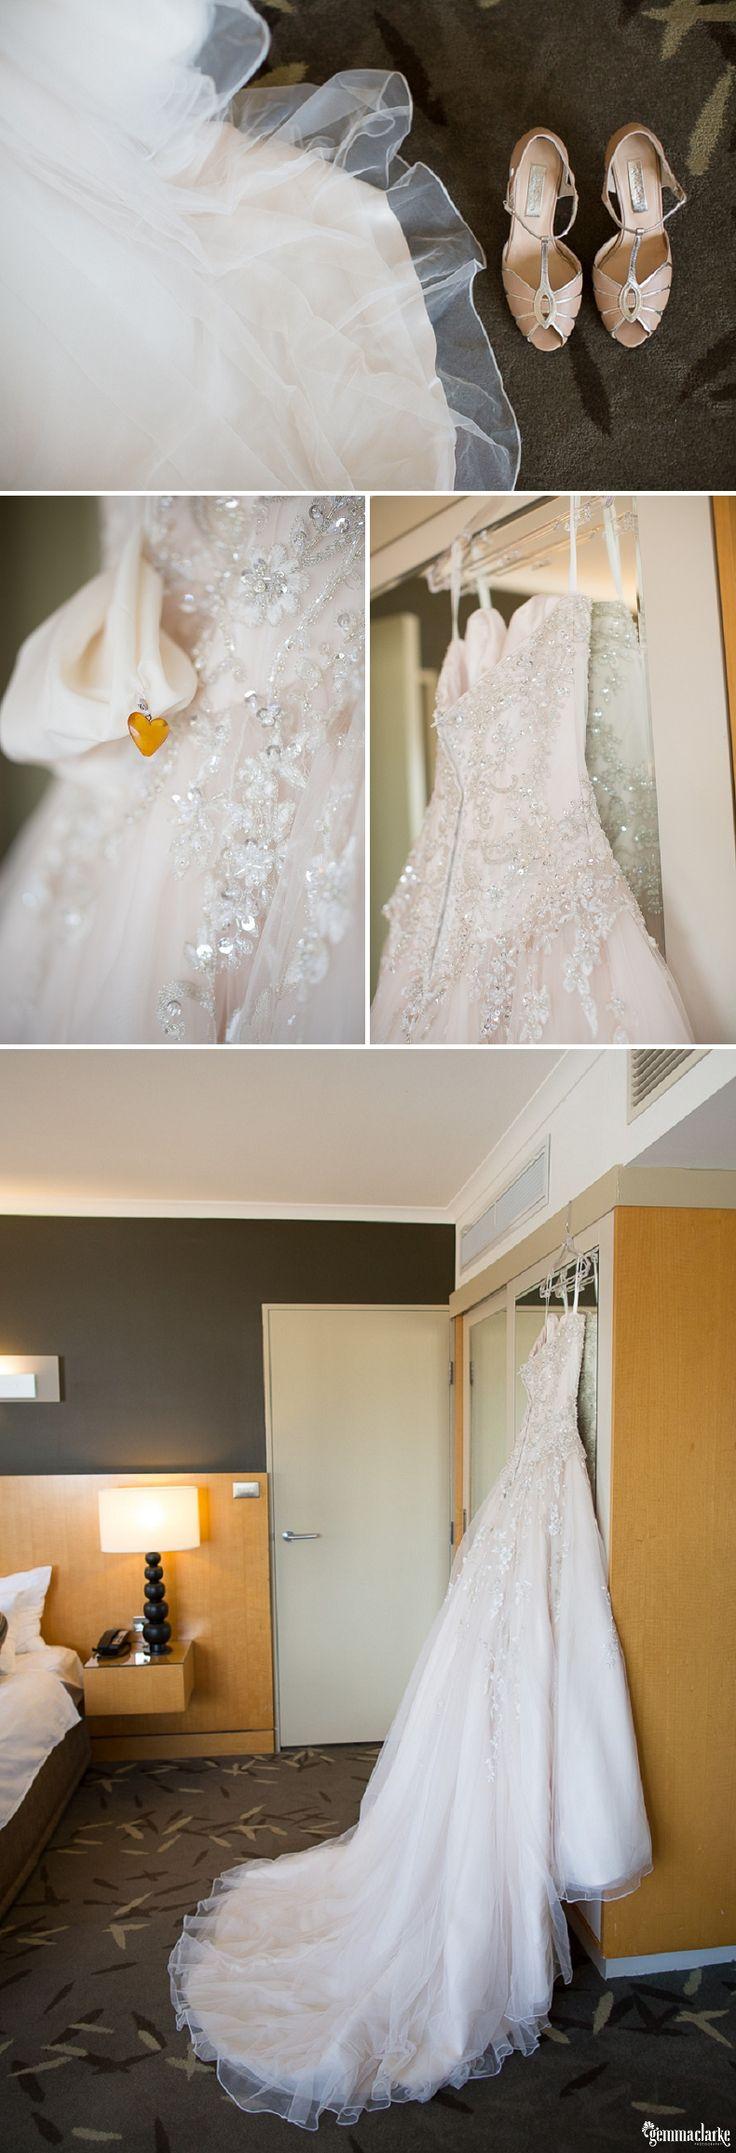 Amy & Ronnie's Wedding – St Charles Borromeo Church and Oatlands House